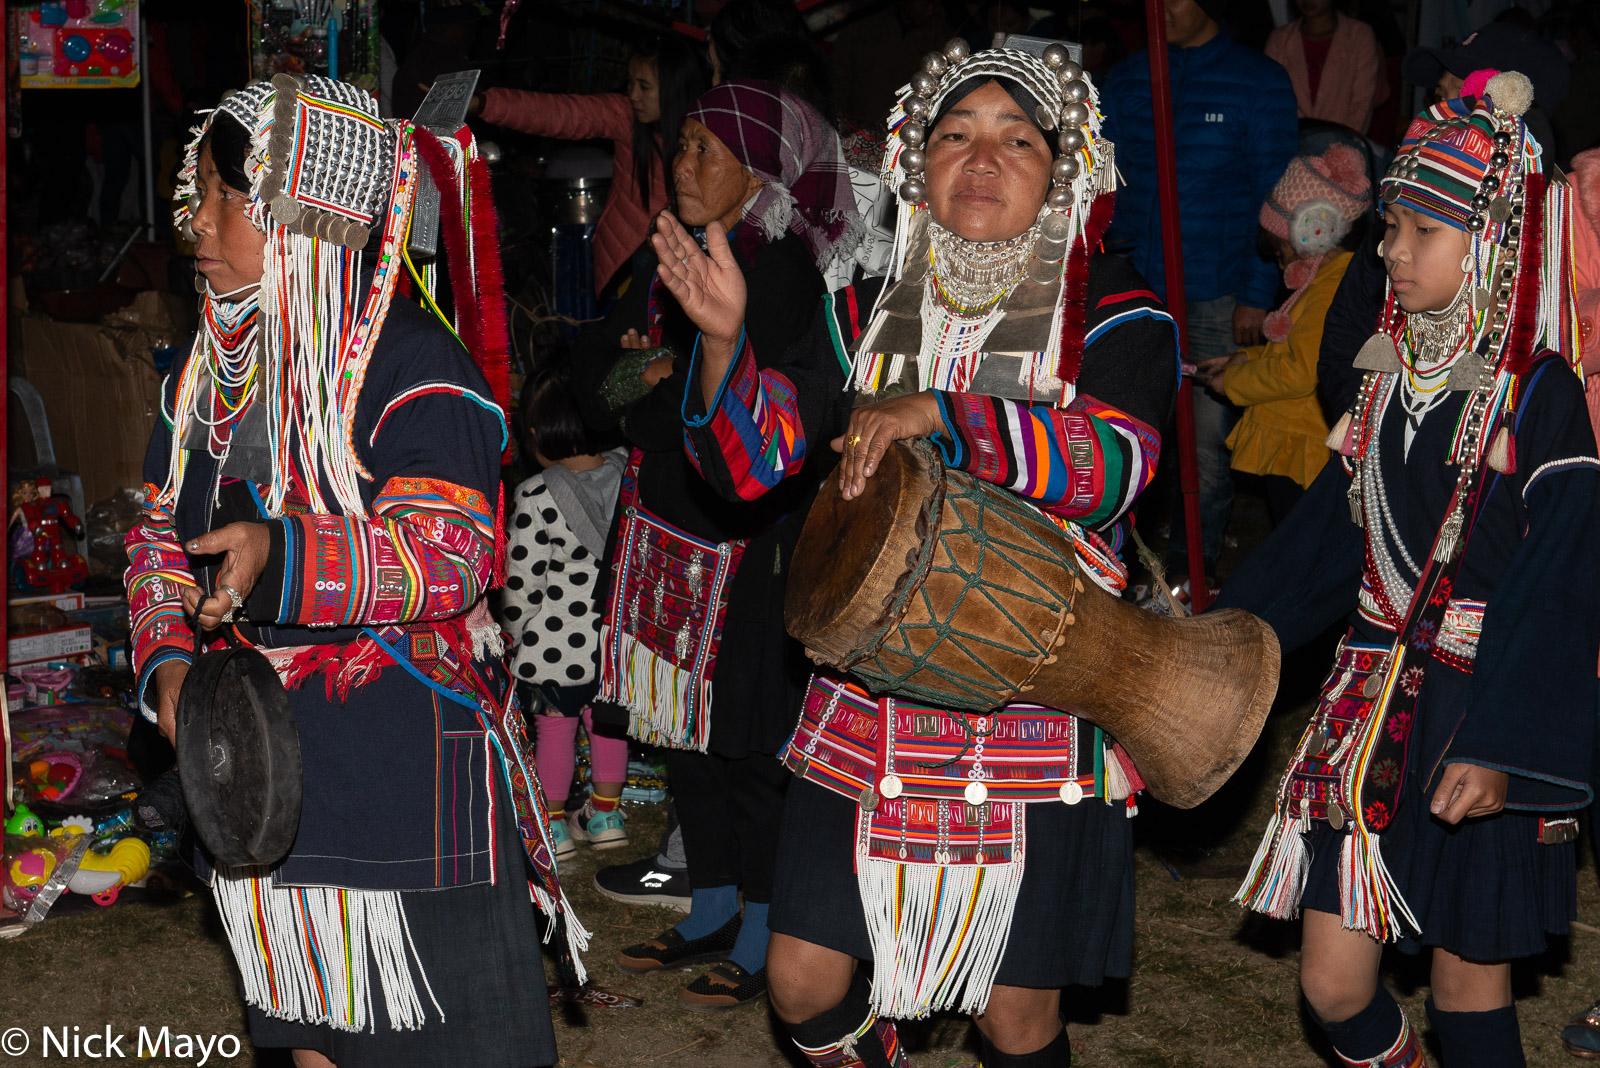 Burma, Circling, Drum, Drumming, Festival, Gong, Hani, Shan State, photo